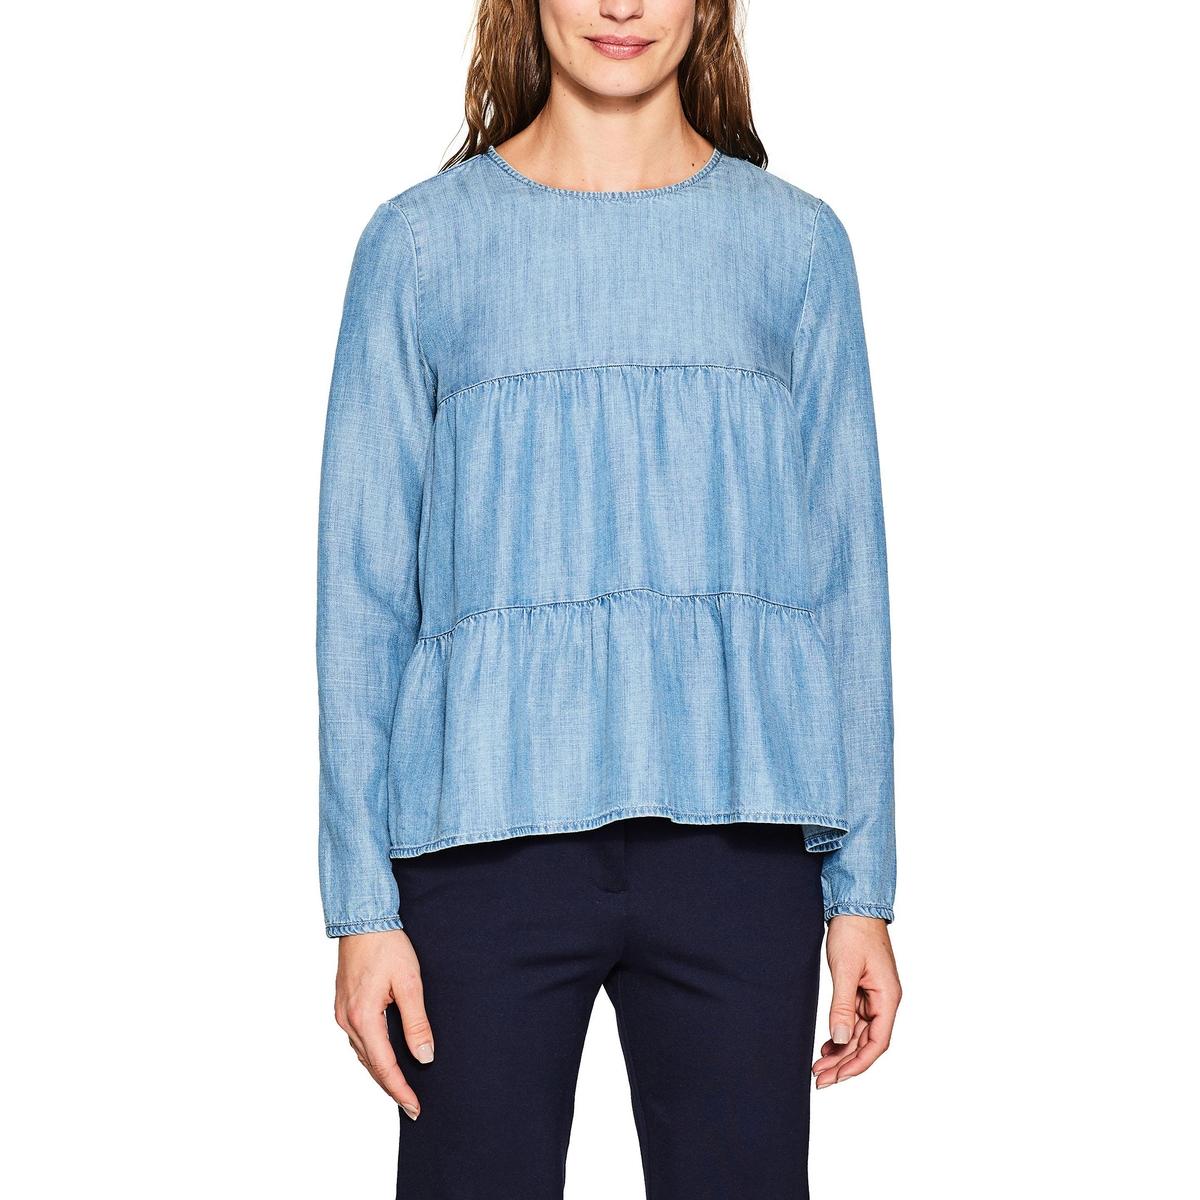 Blusa lisa con cuello redondo, manga larga